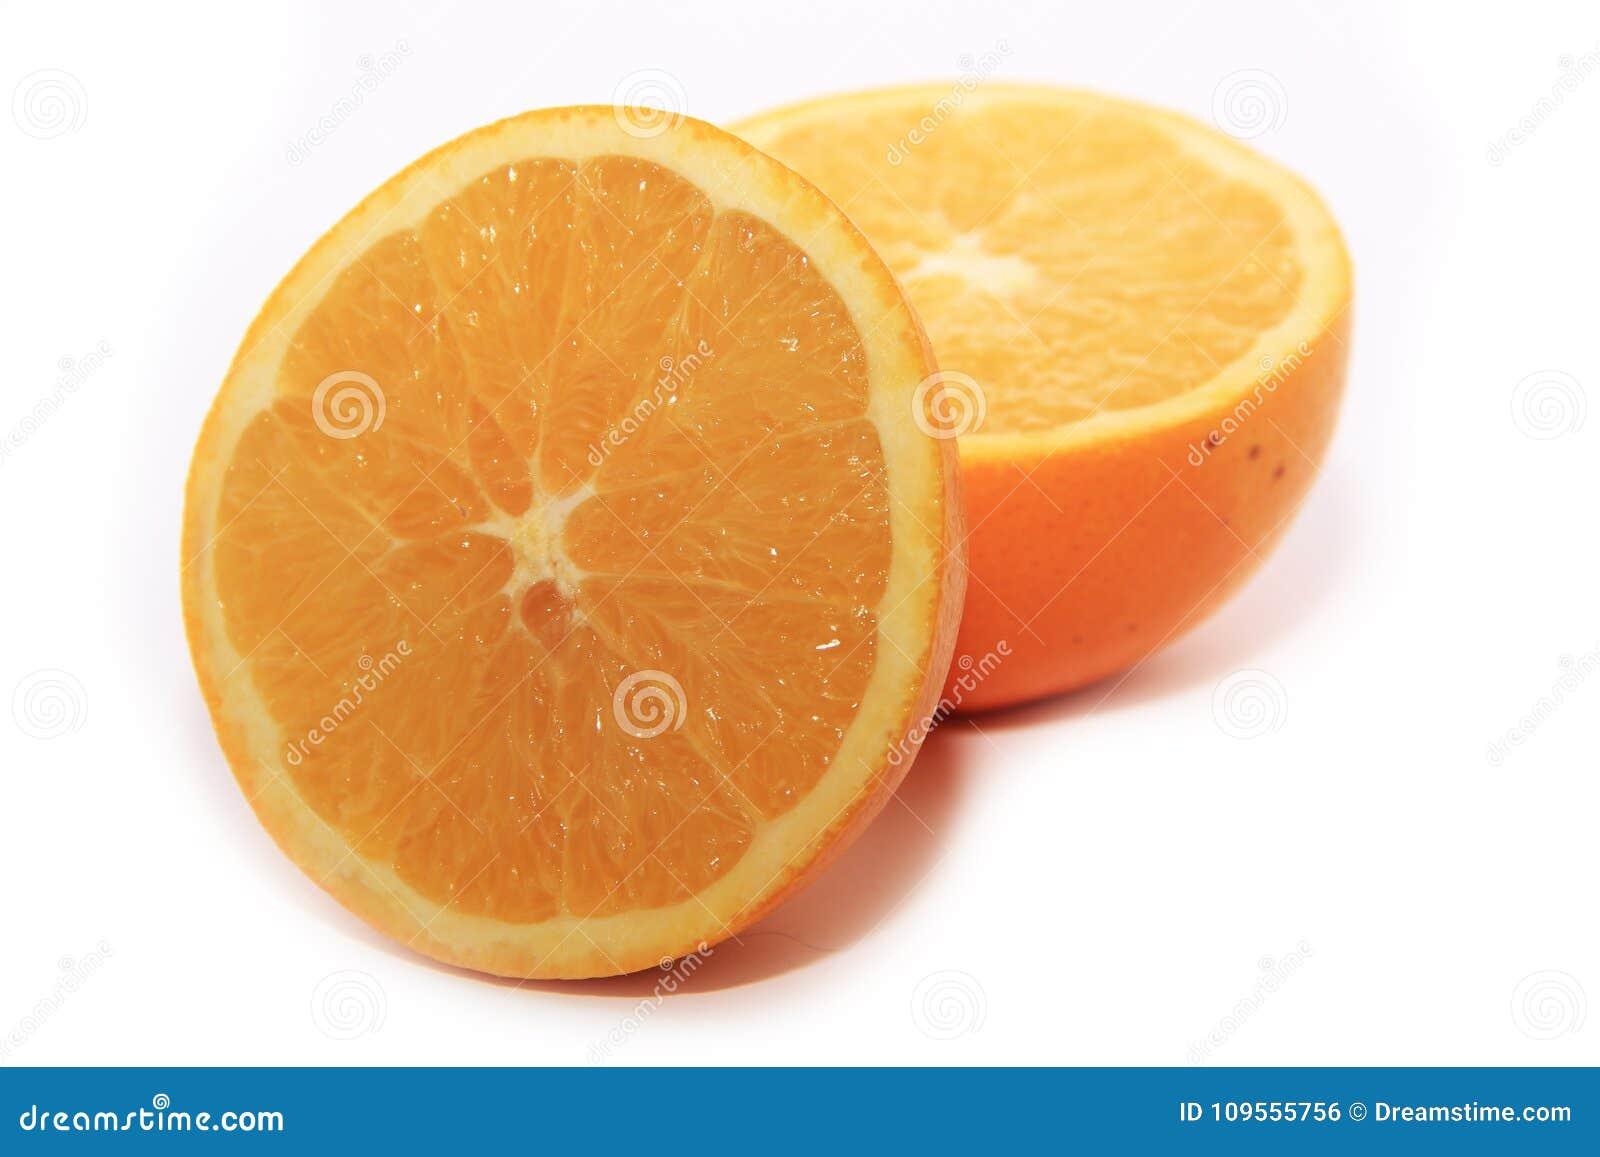 Juicy πορτοκάλι που κόβεται στα μισά σε ένα άσπρο υπόβαθρο